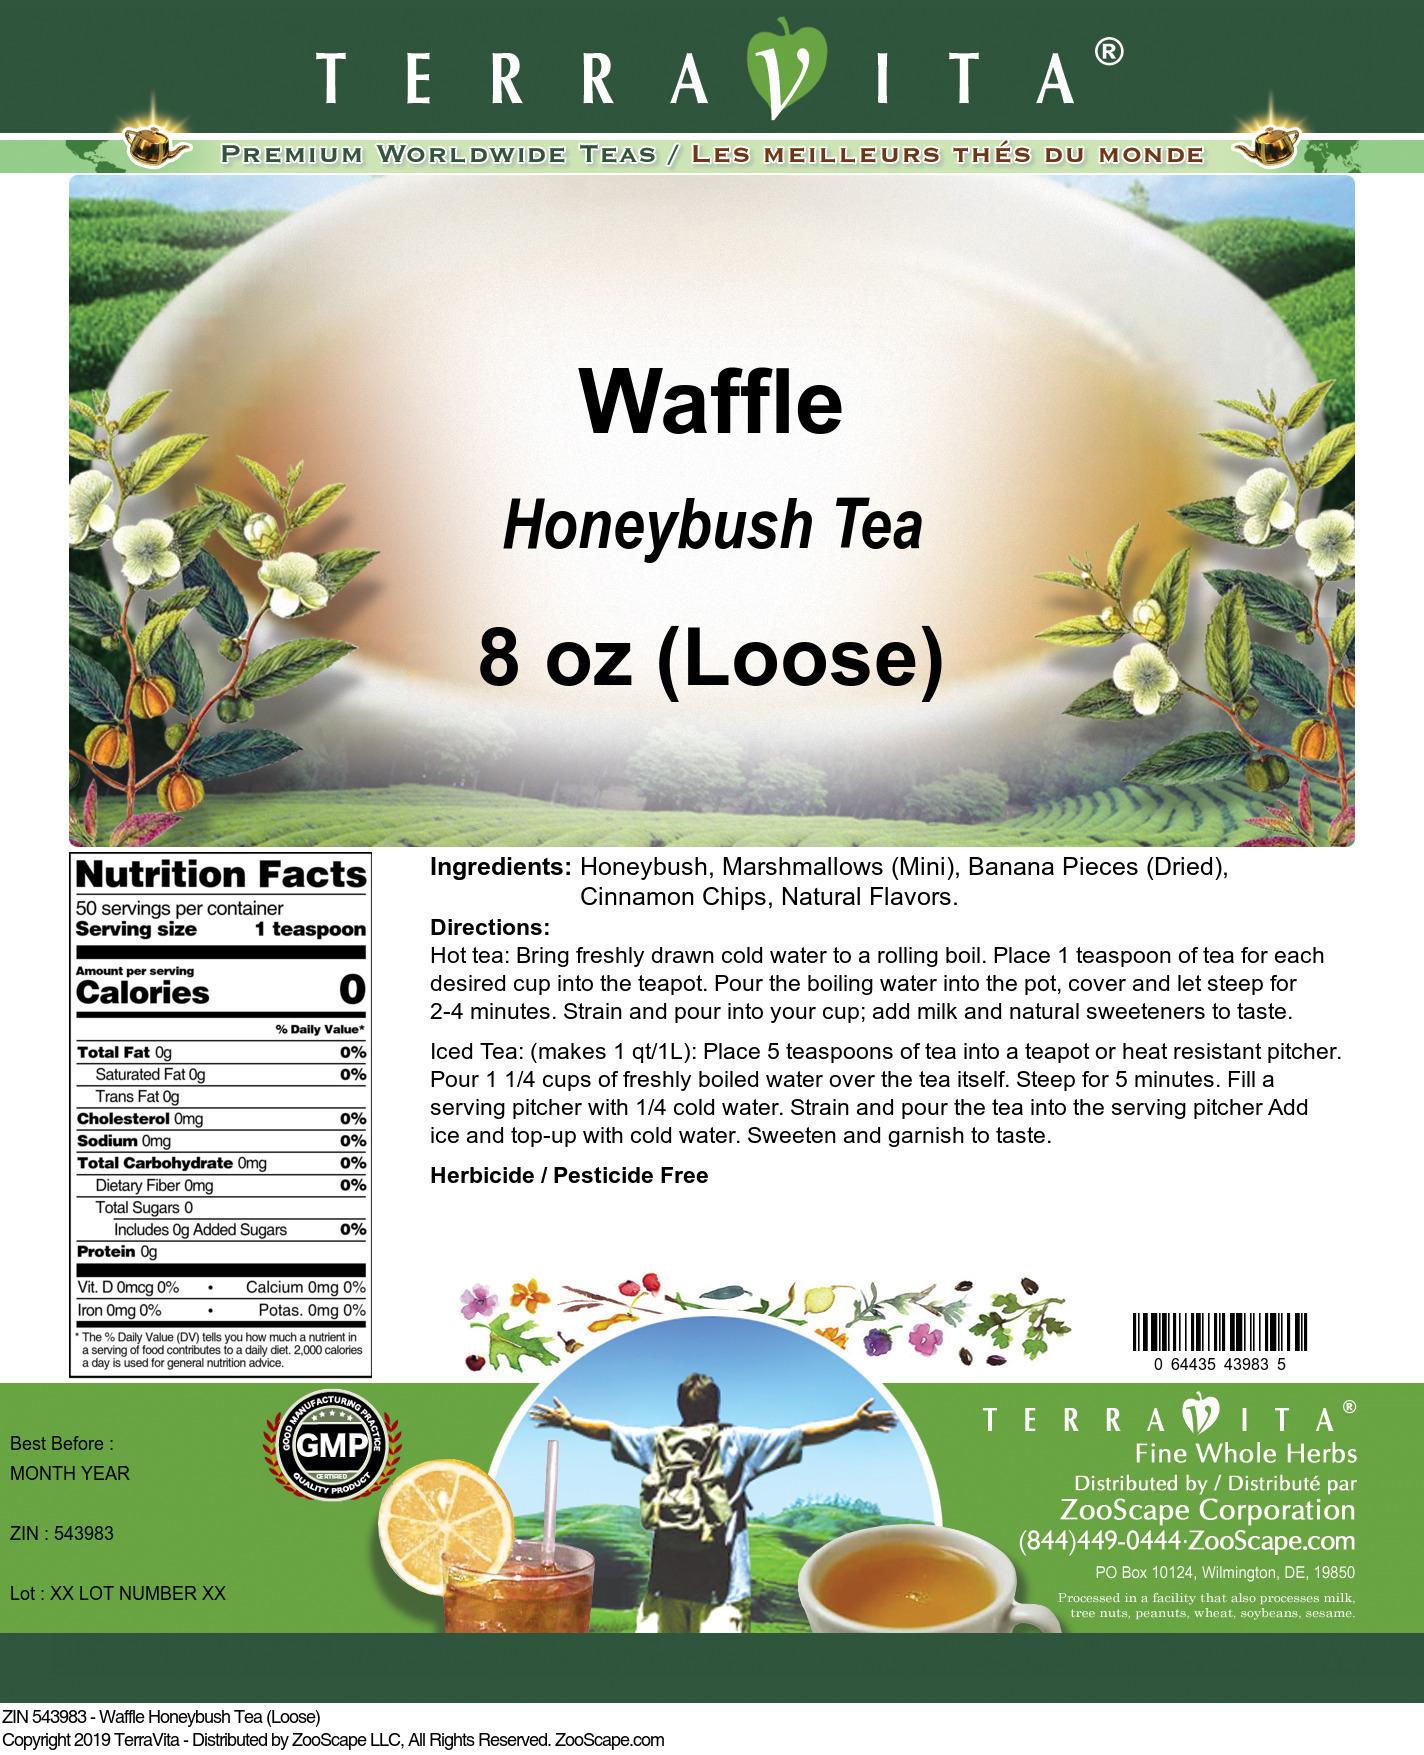 Waffle Honeybush Tea